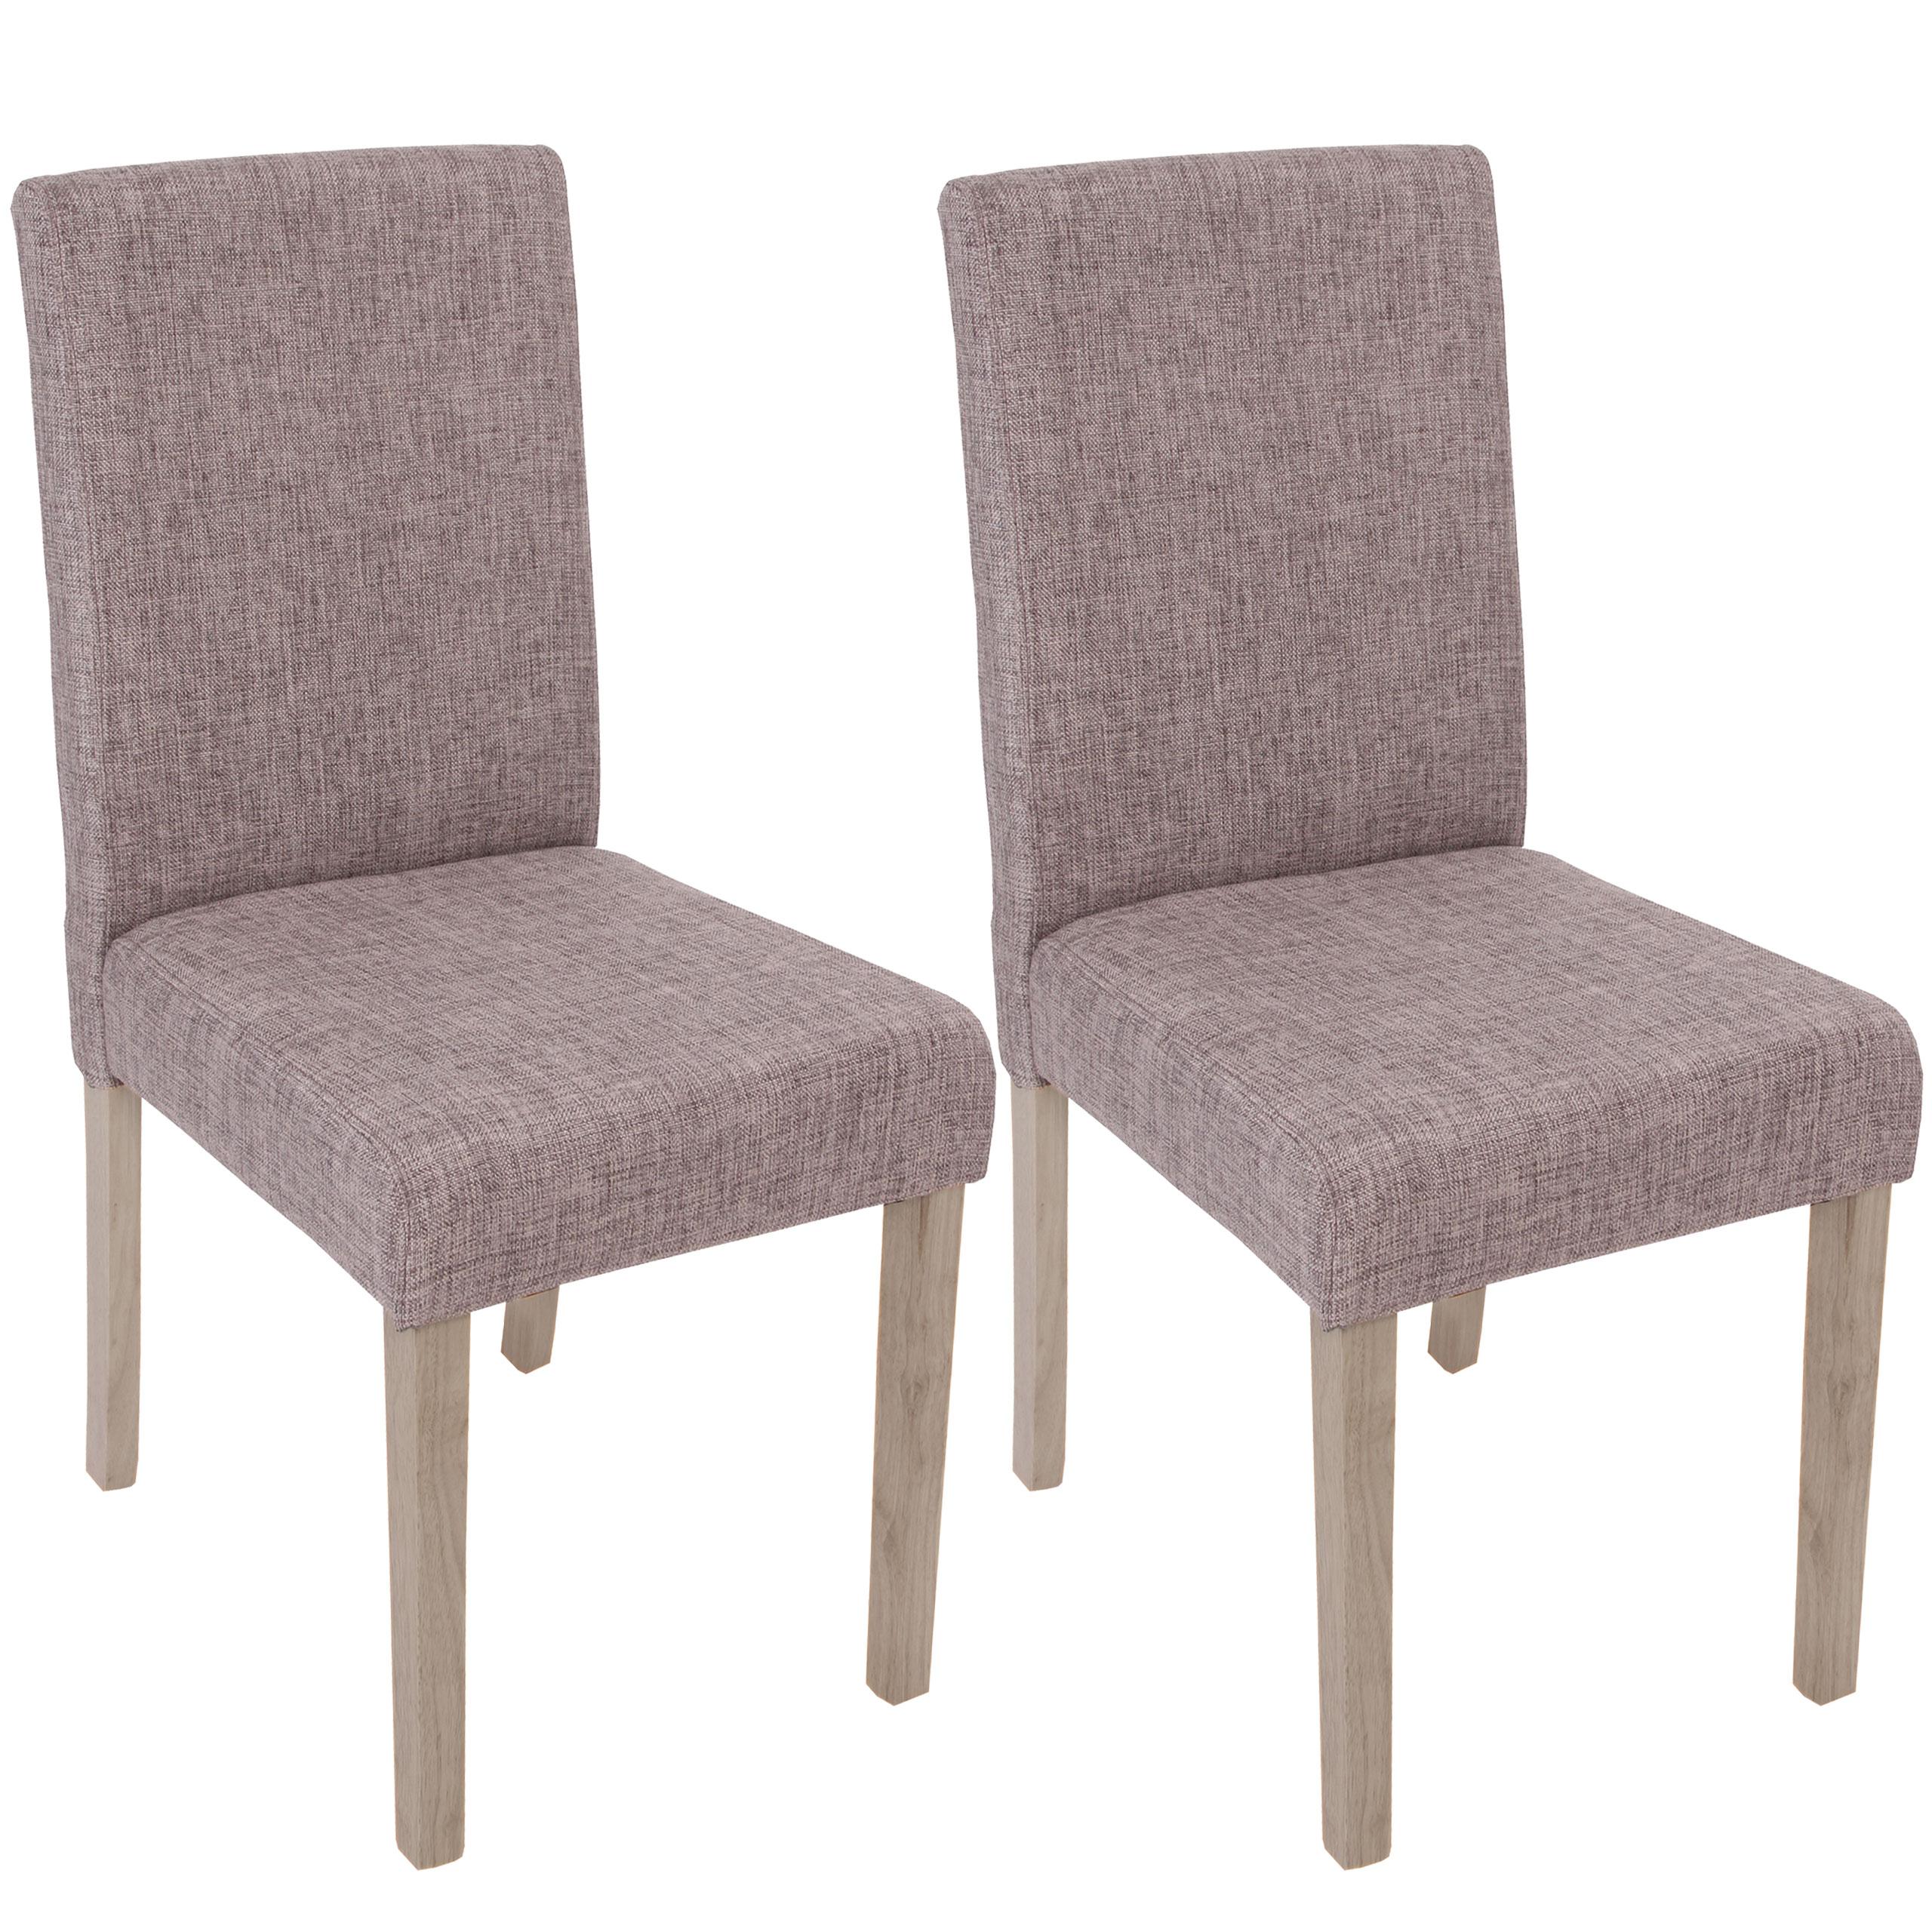 2x esszimmerstuhl littau stuhl lehnstuhl textil grau - Stuhl grau eiche ...